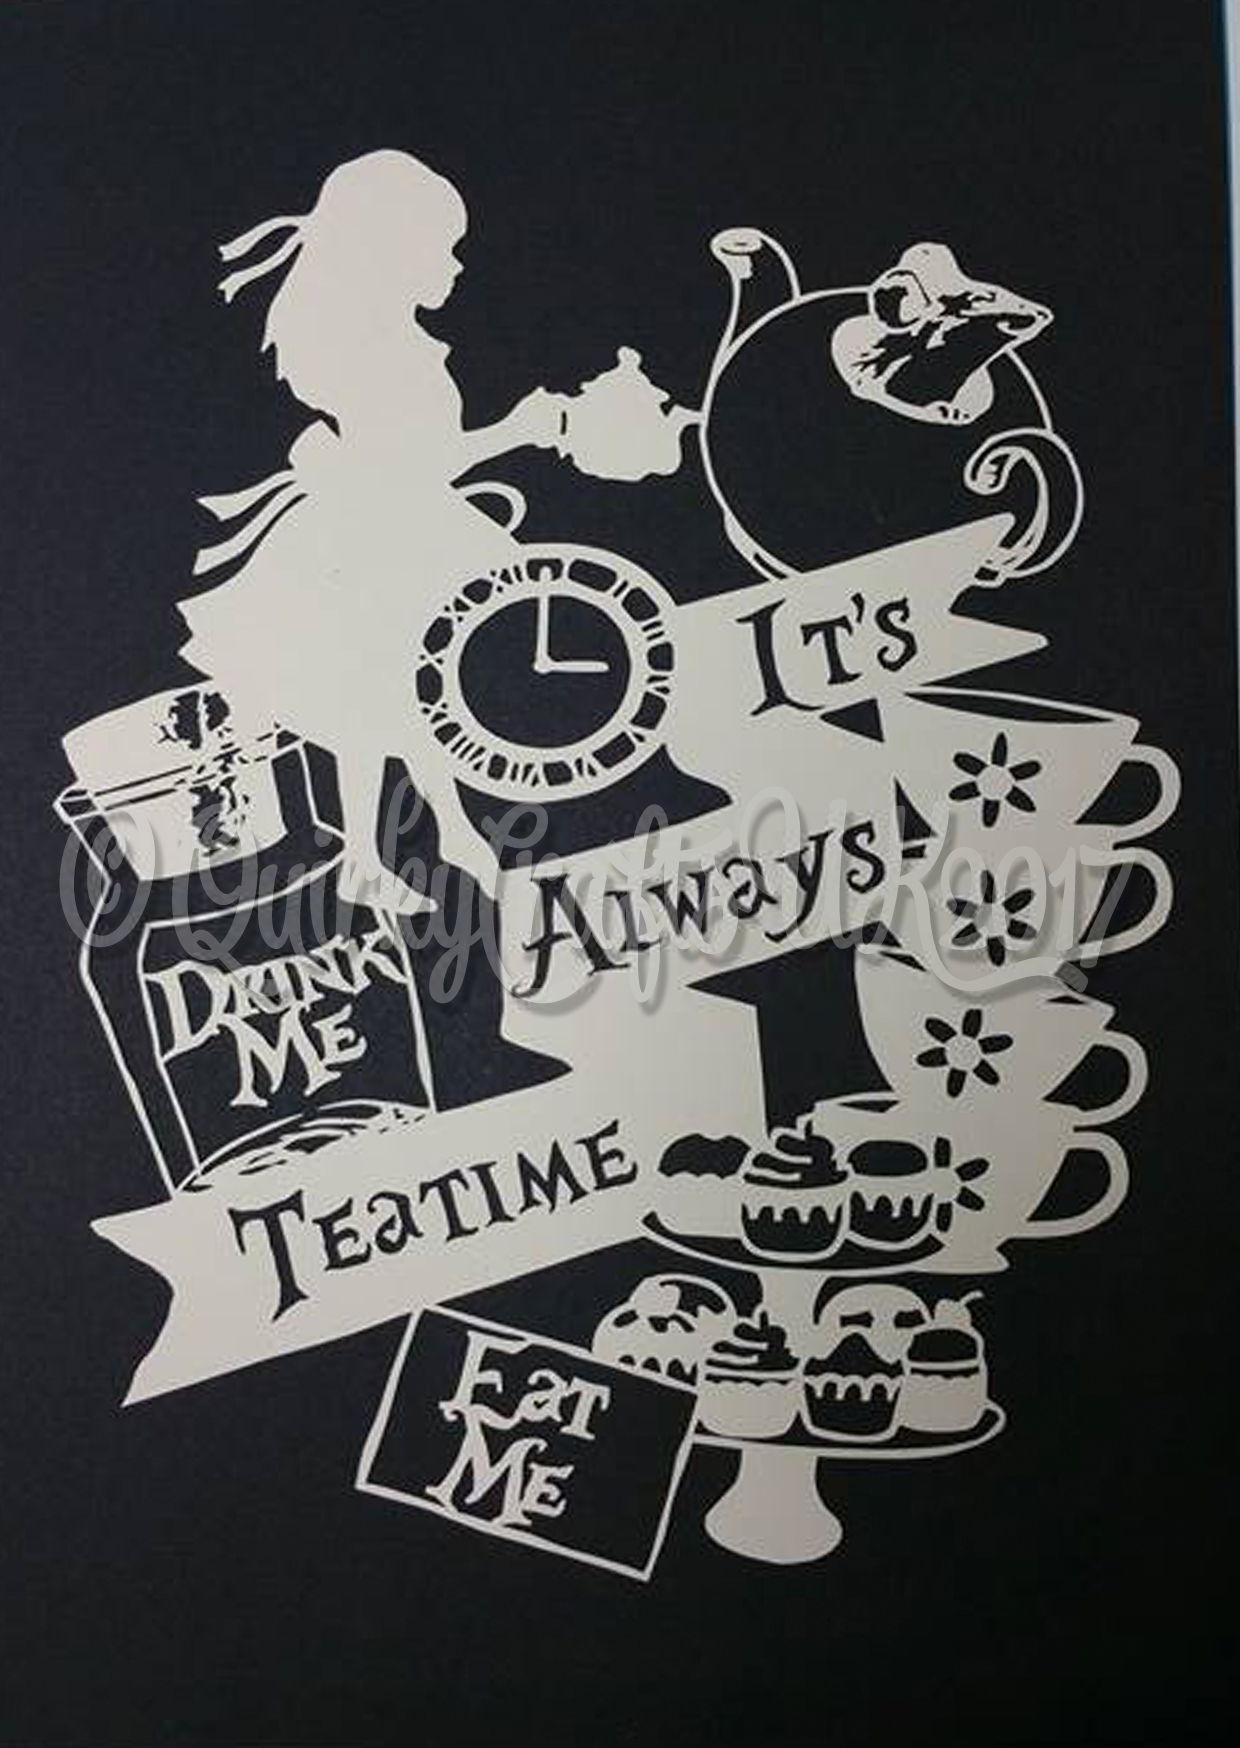 It's always teatime  example image 2